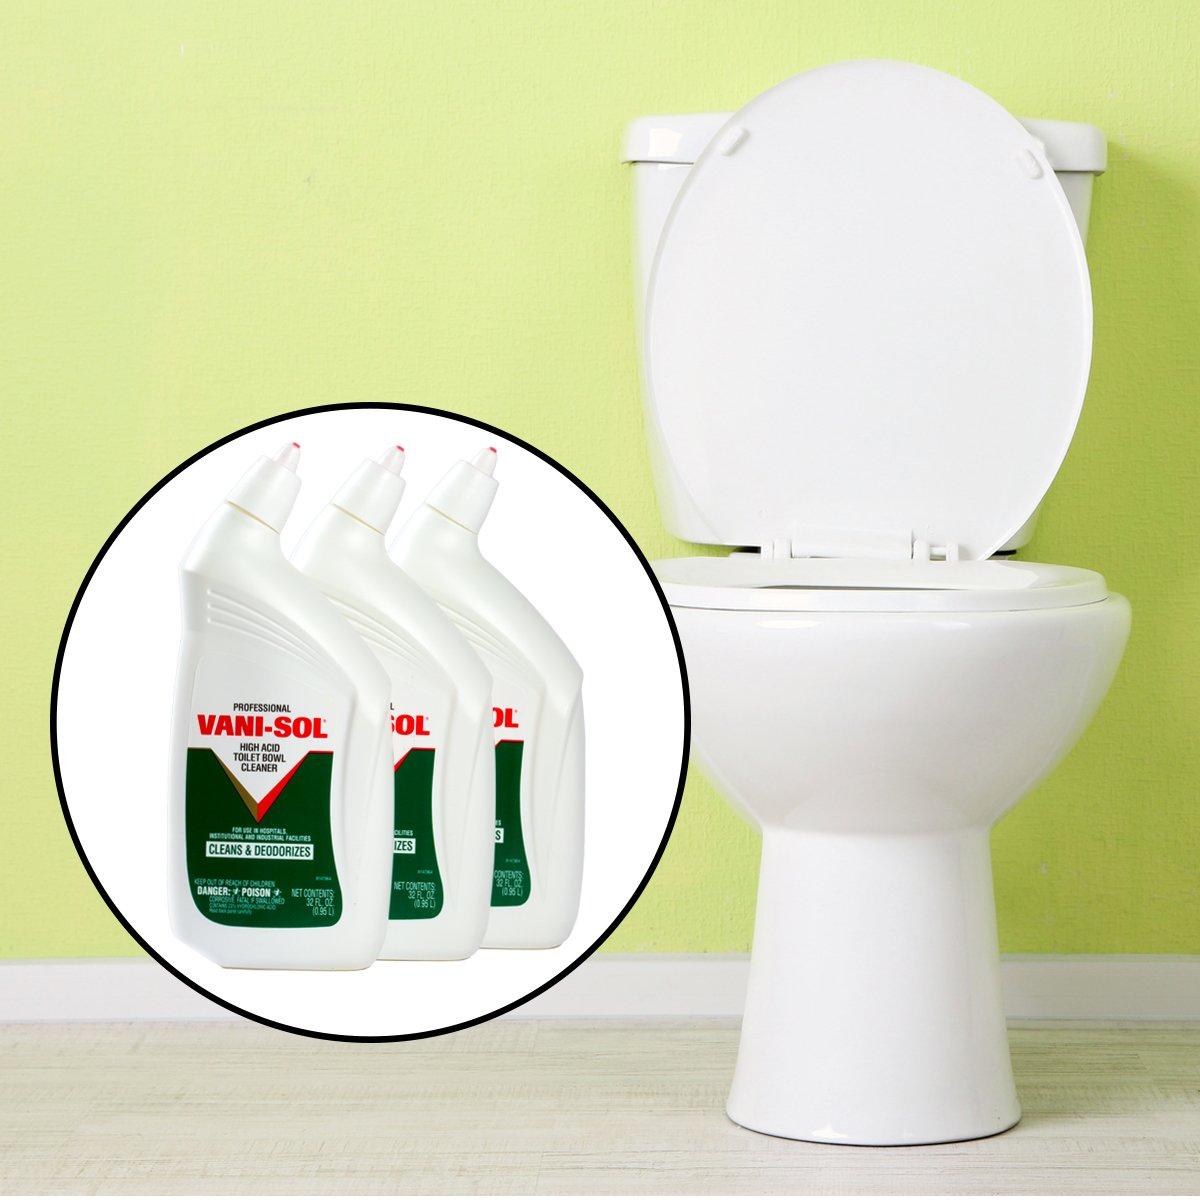 Amazon.com: Vani-Sol Professional Toilet Bowl Cleaner (32 fl. oz., 3 ...